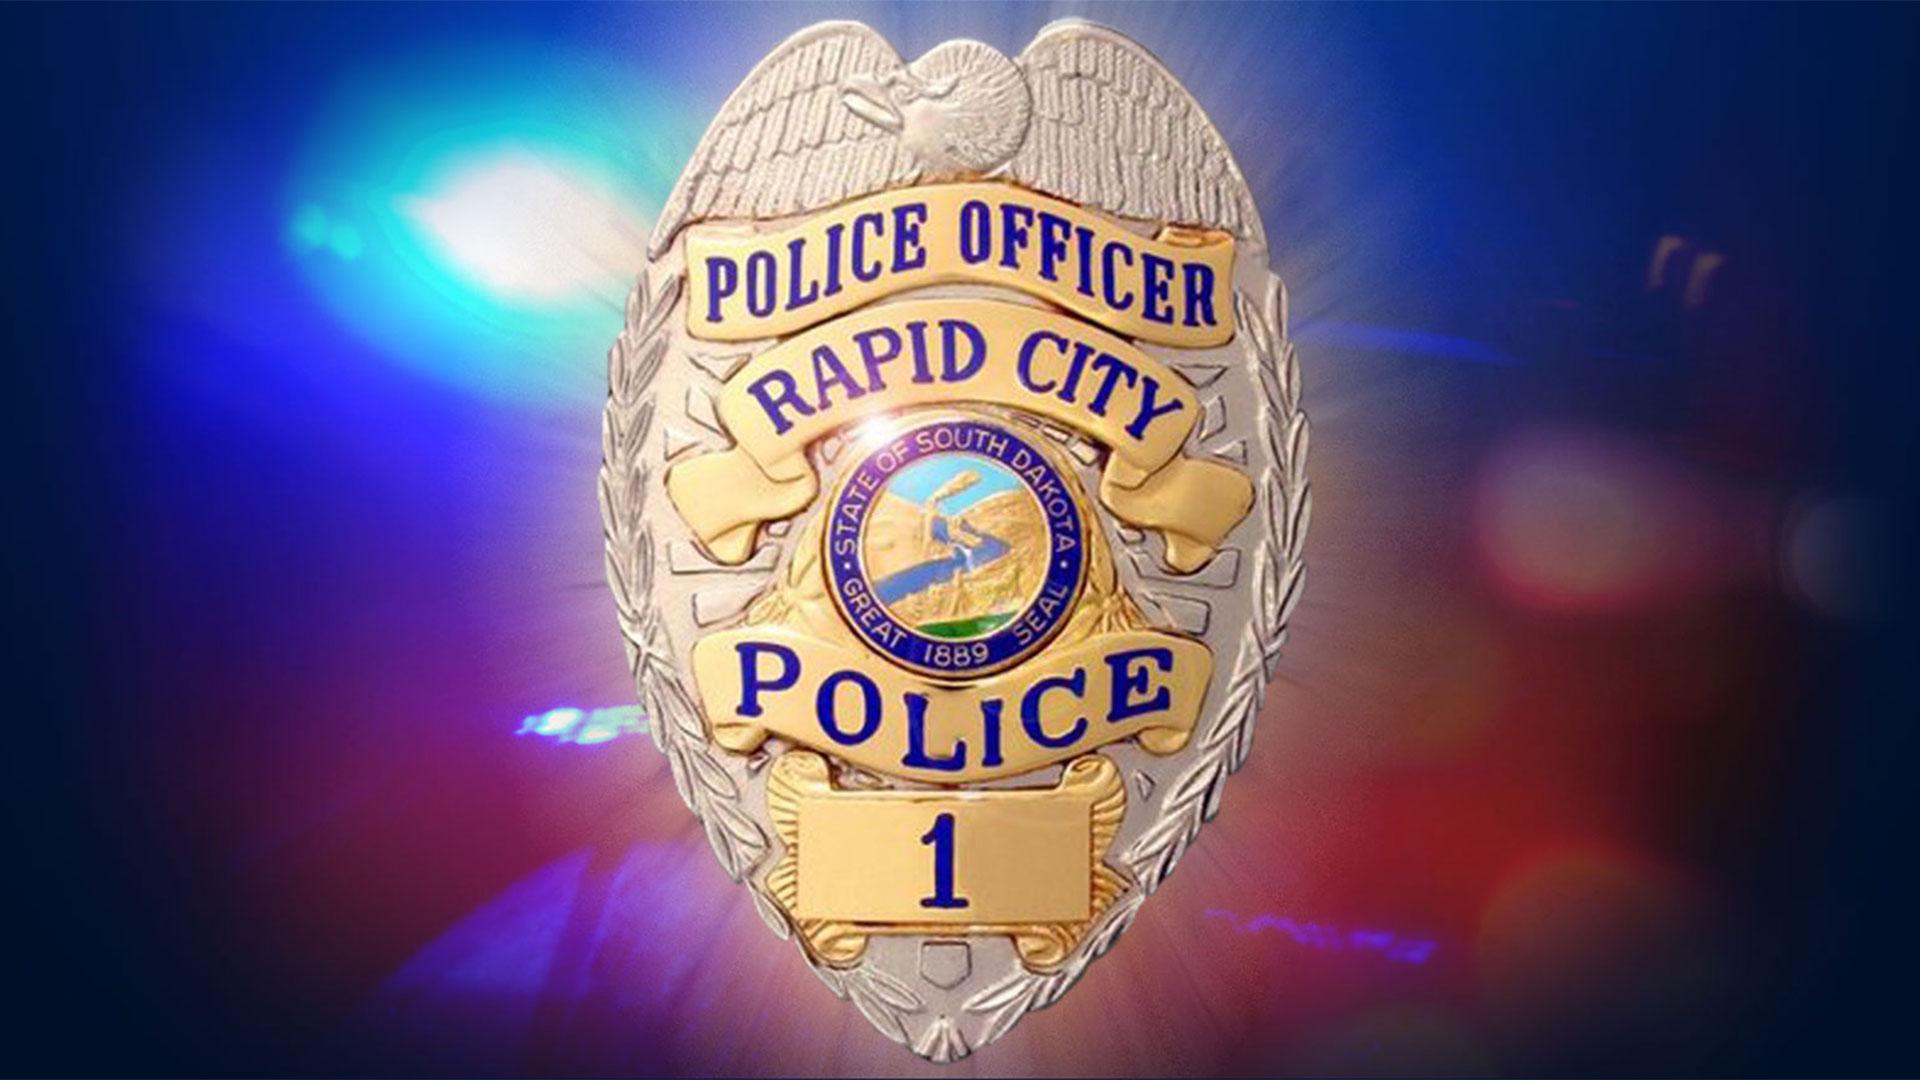 KELO Rapid City Police badge